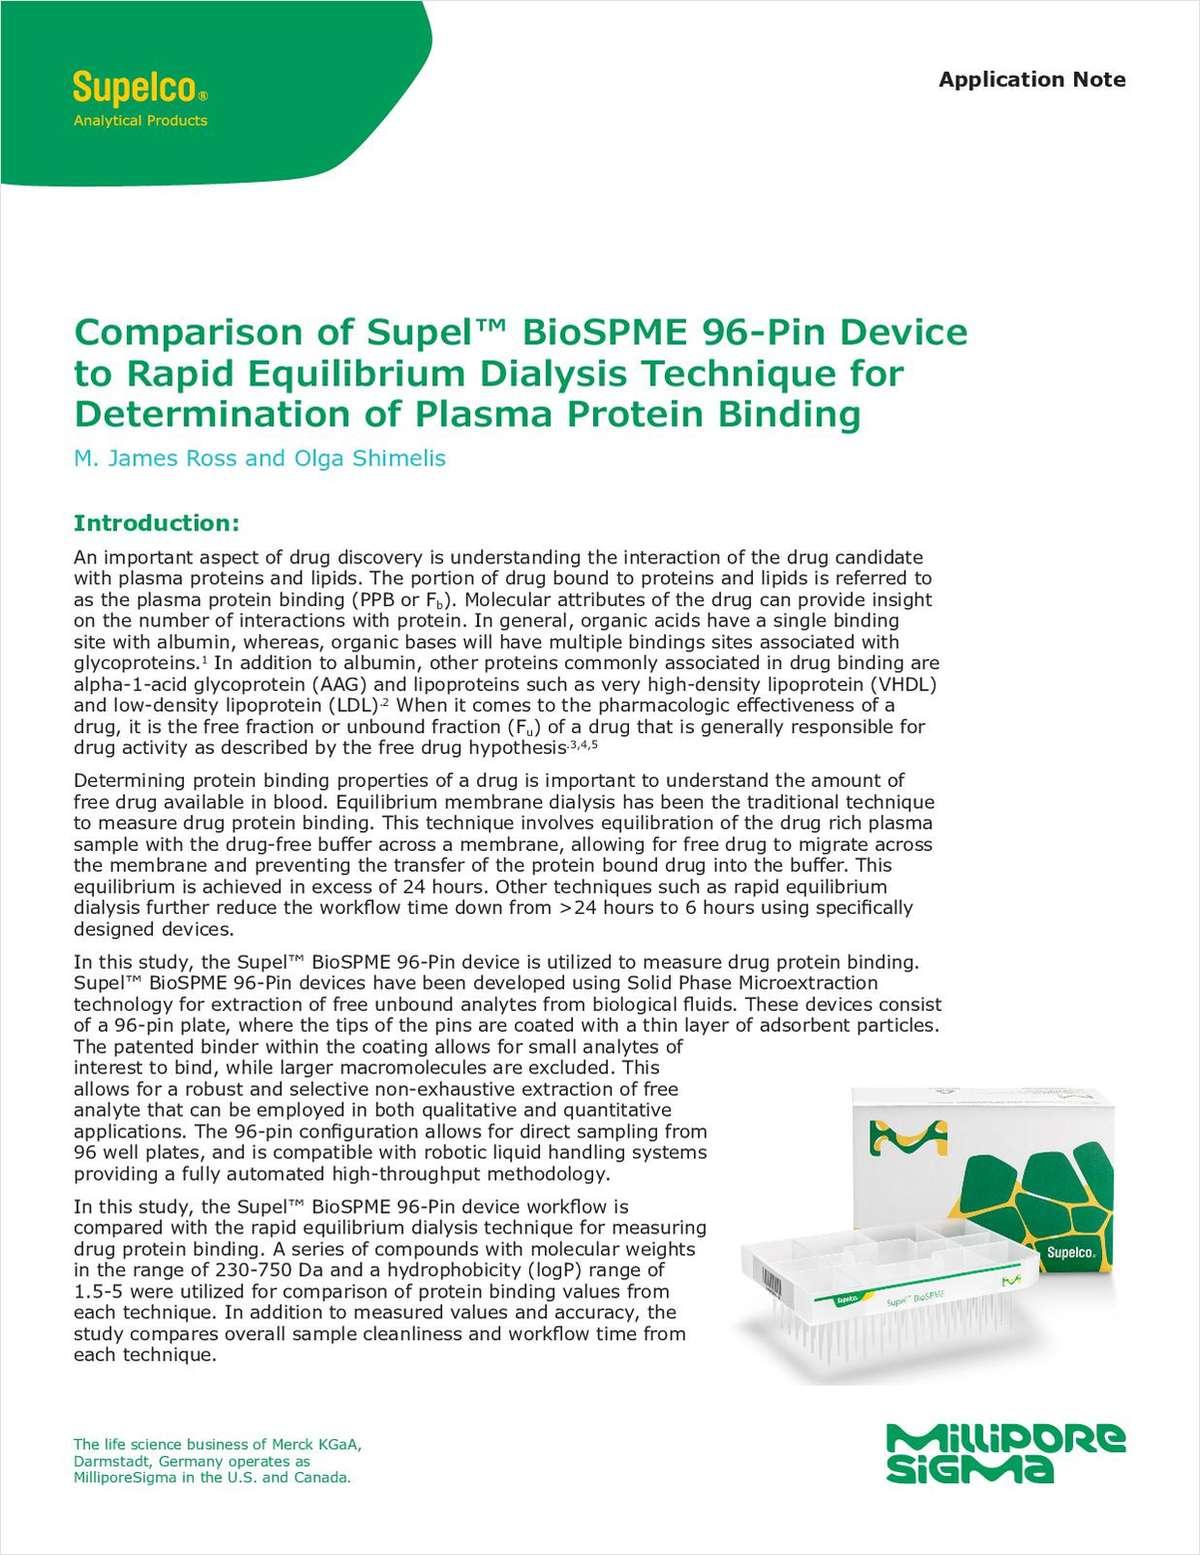 Comparison of Supel BioSPME 96-Pin Device to Rapid Equilibrium Dialysis Technique for Determination of Plasma Protein Binding